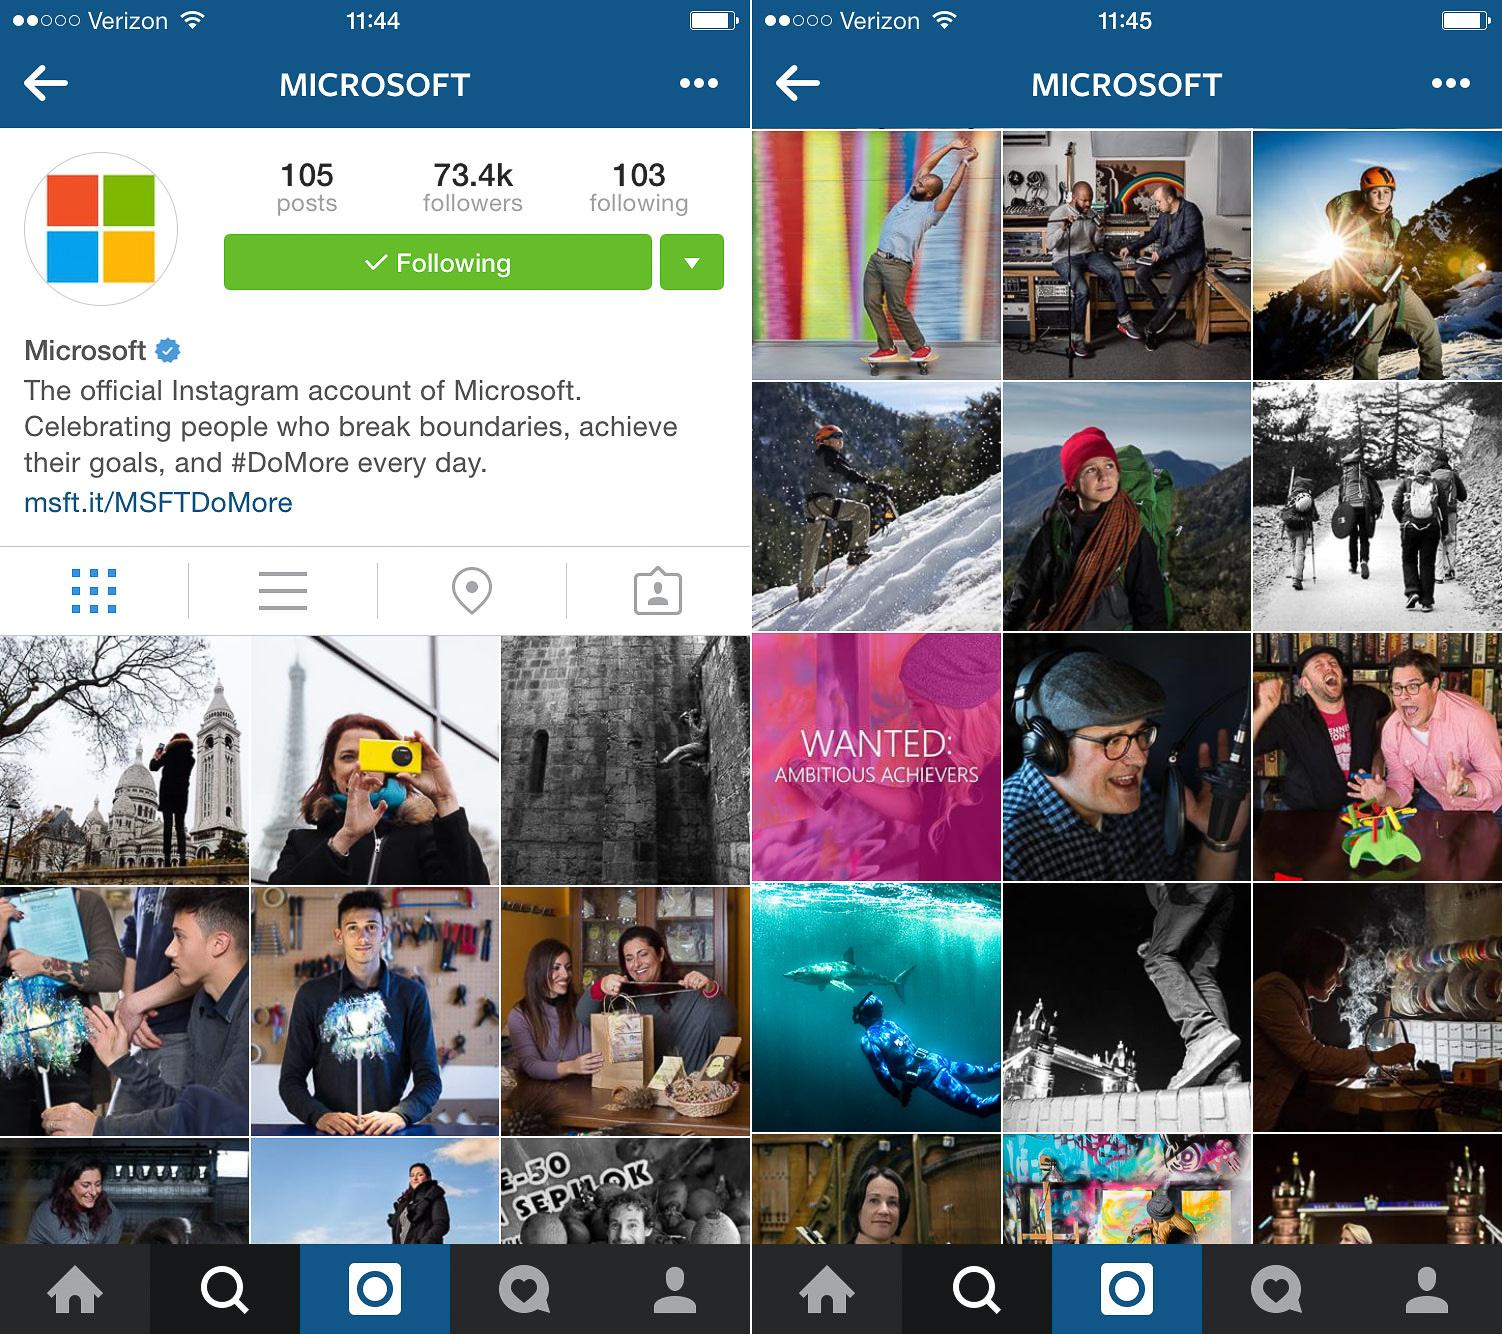 JBP_WEB_Microsoft_Instagram_Home_D01.jpg